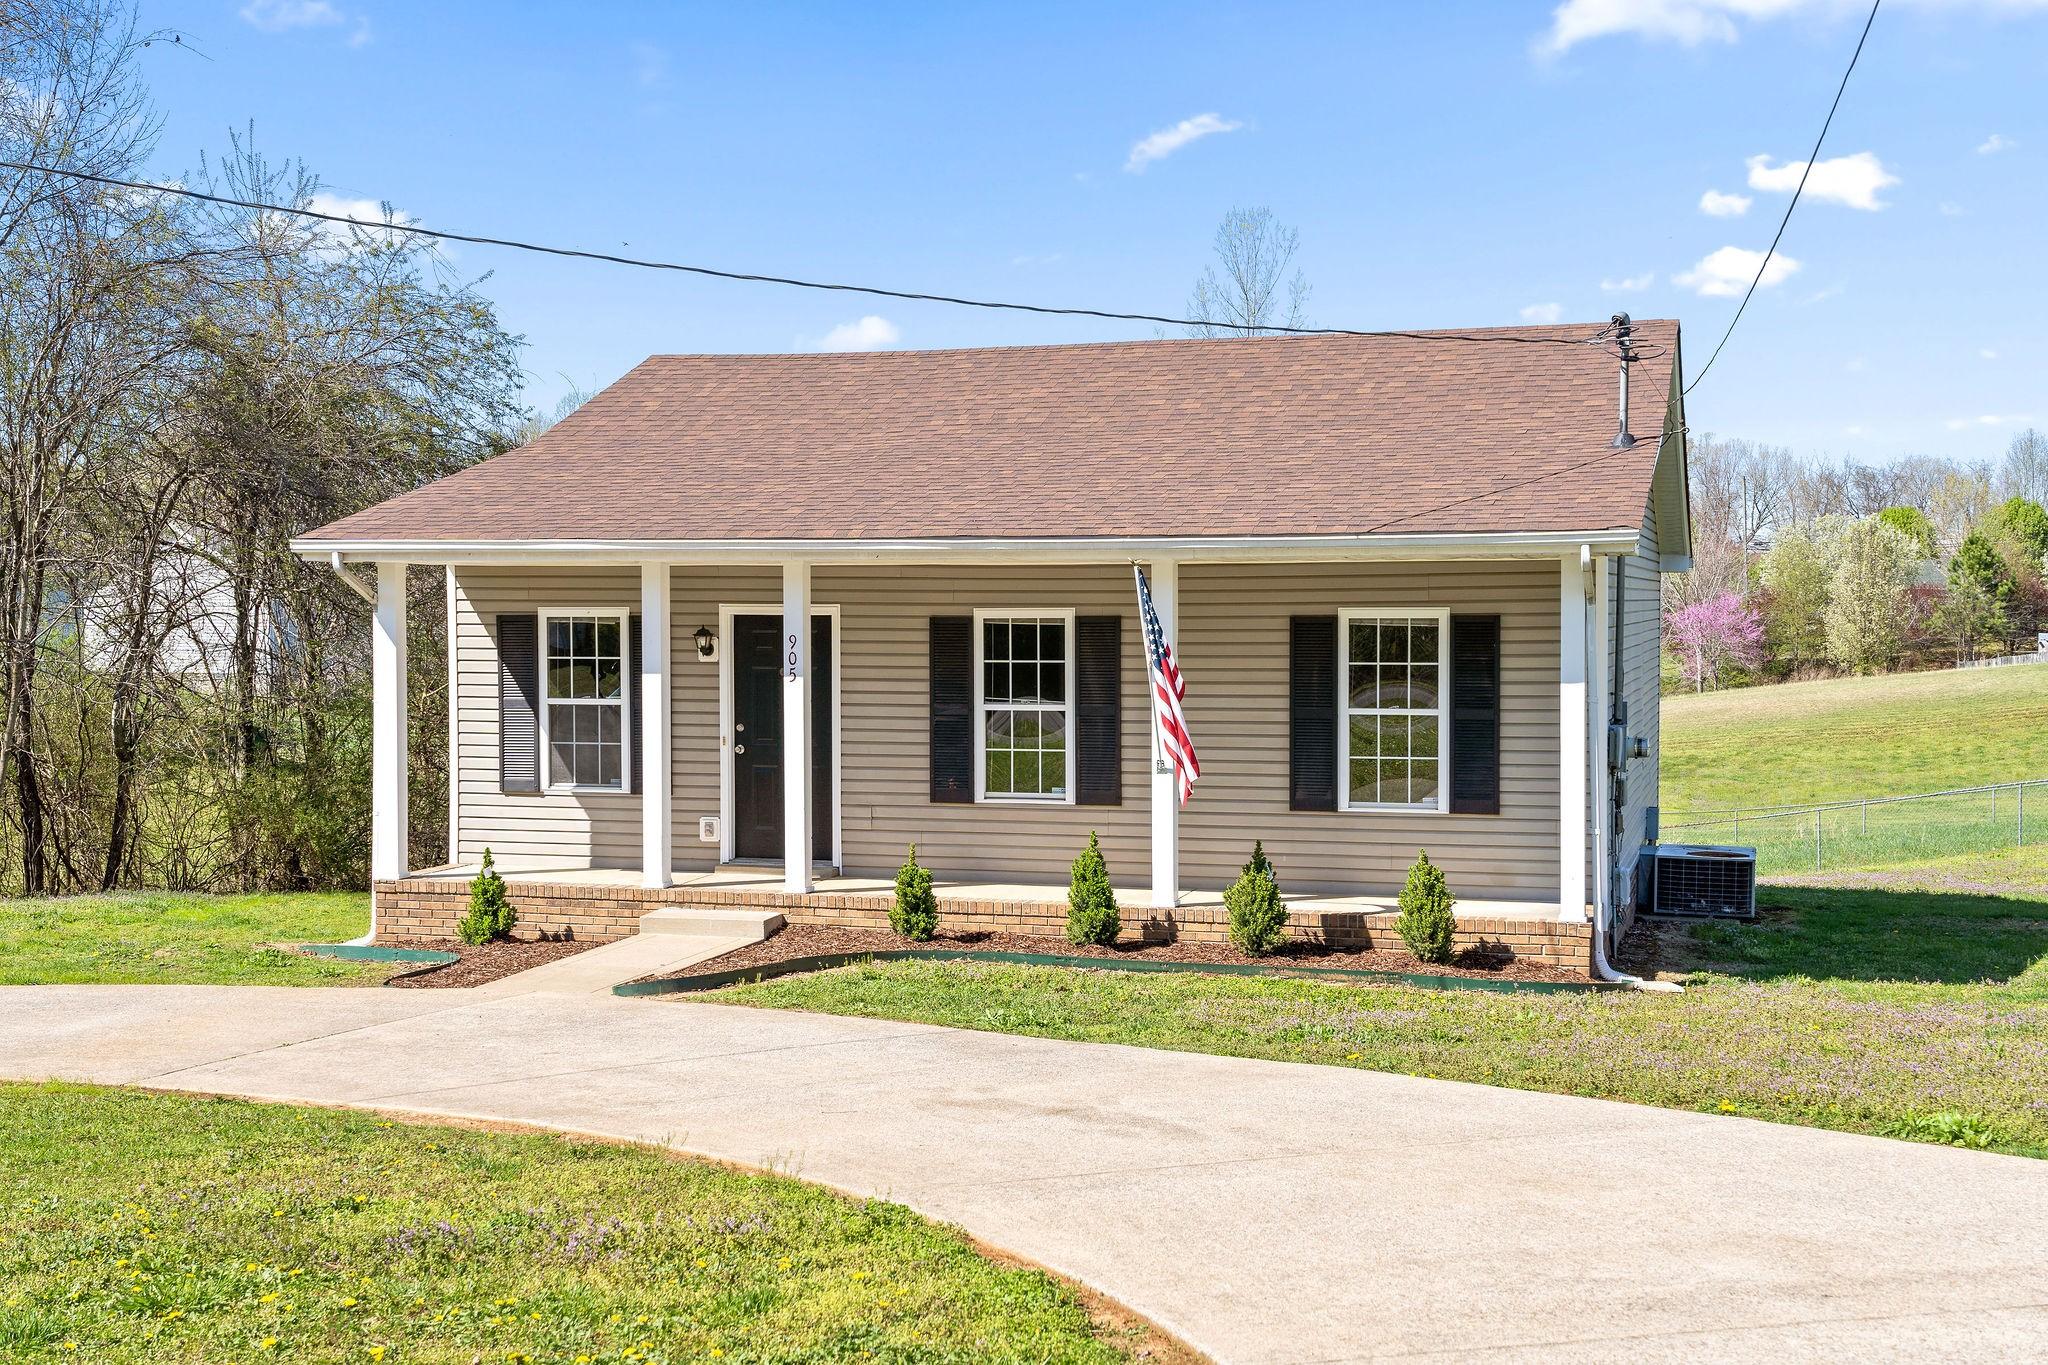 905 Applegrove Cir Property Photo - Clarksville, TN real estate listing